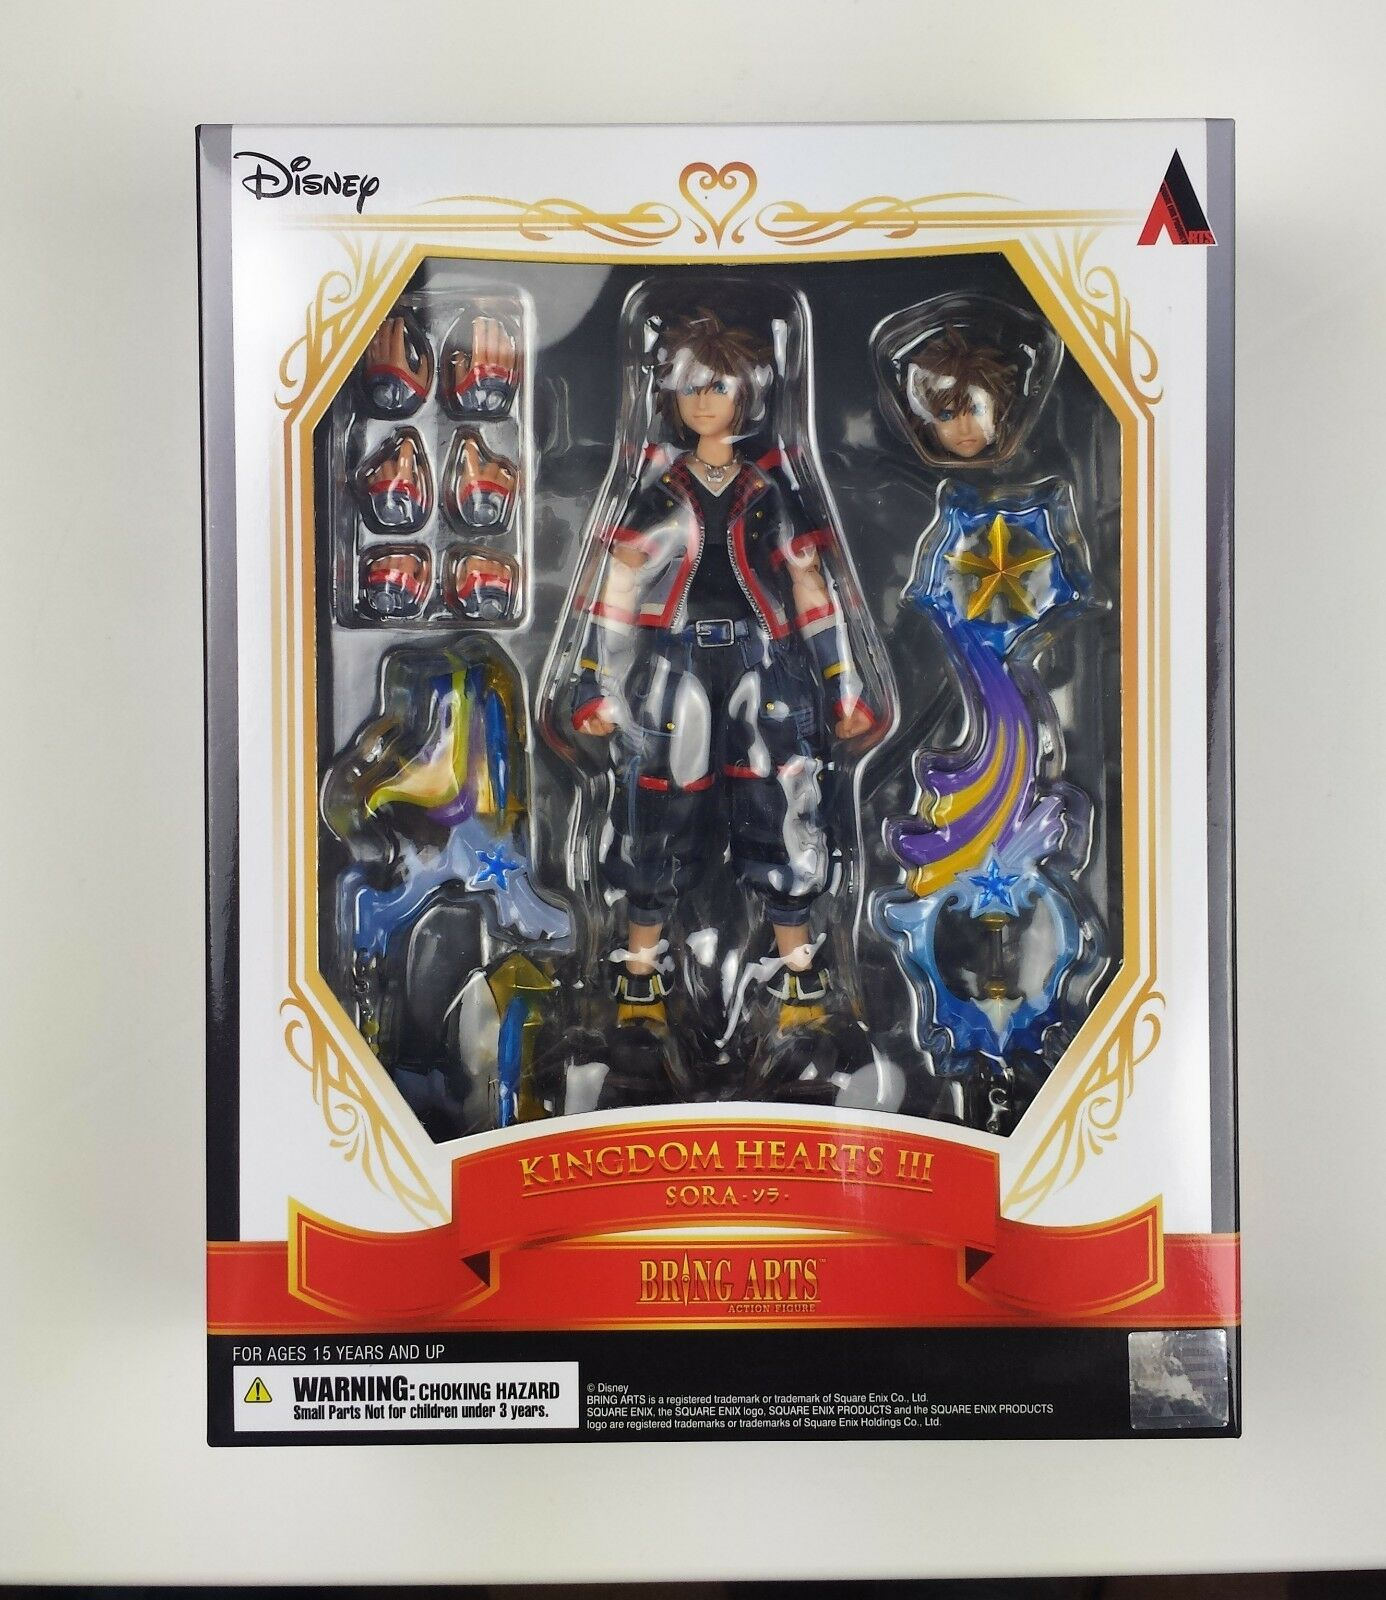 Sora Kingdom Hearts III 3 Bring Arts Square Enix Action Figure 2019 Brand New